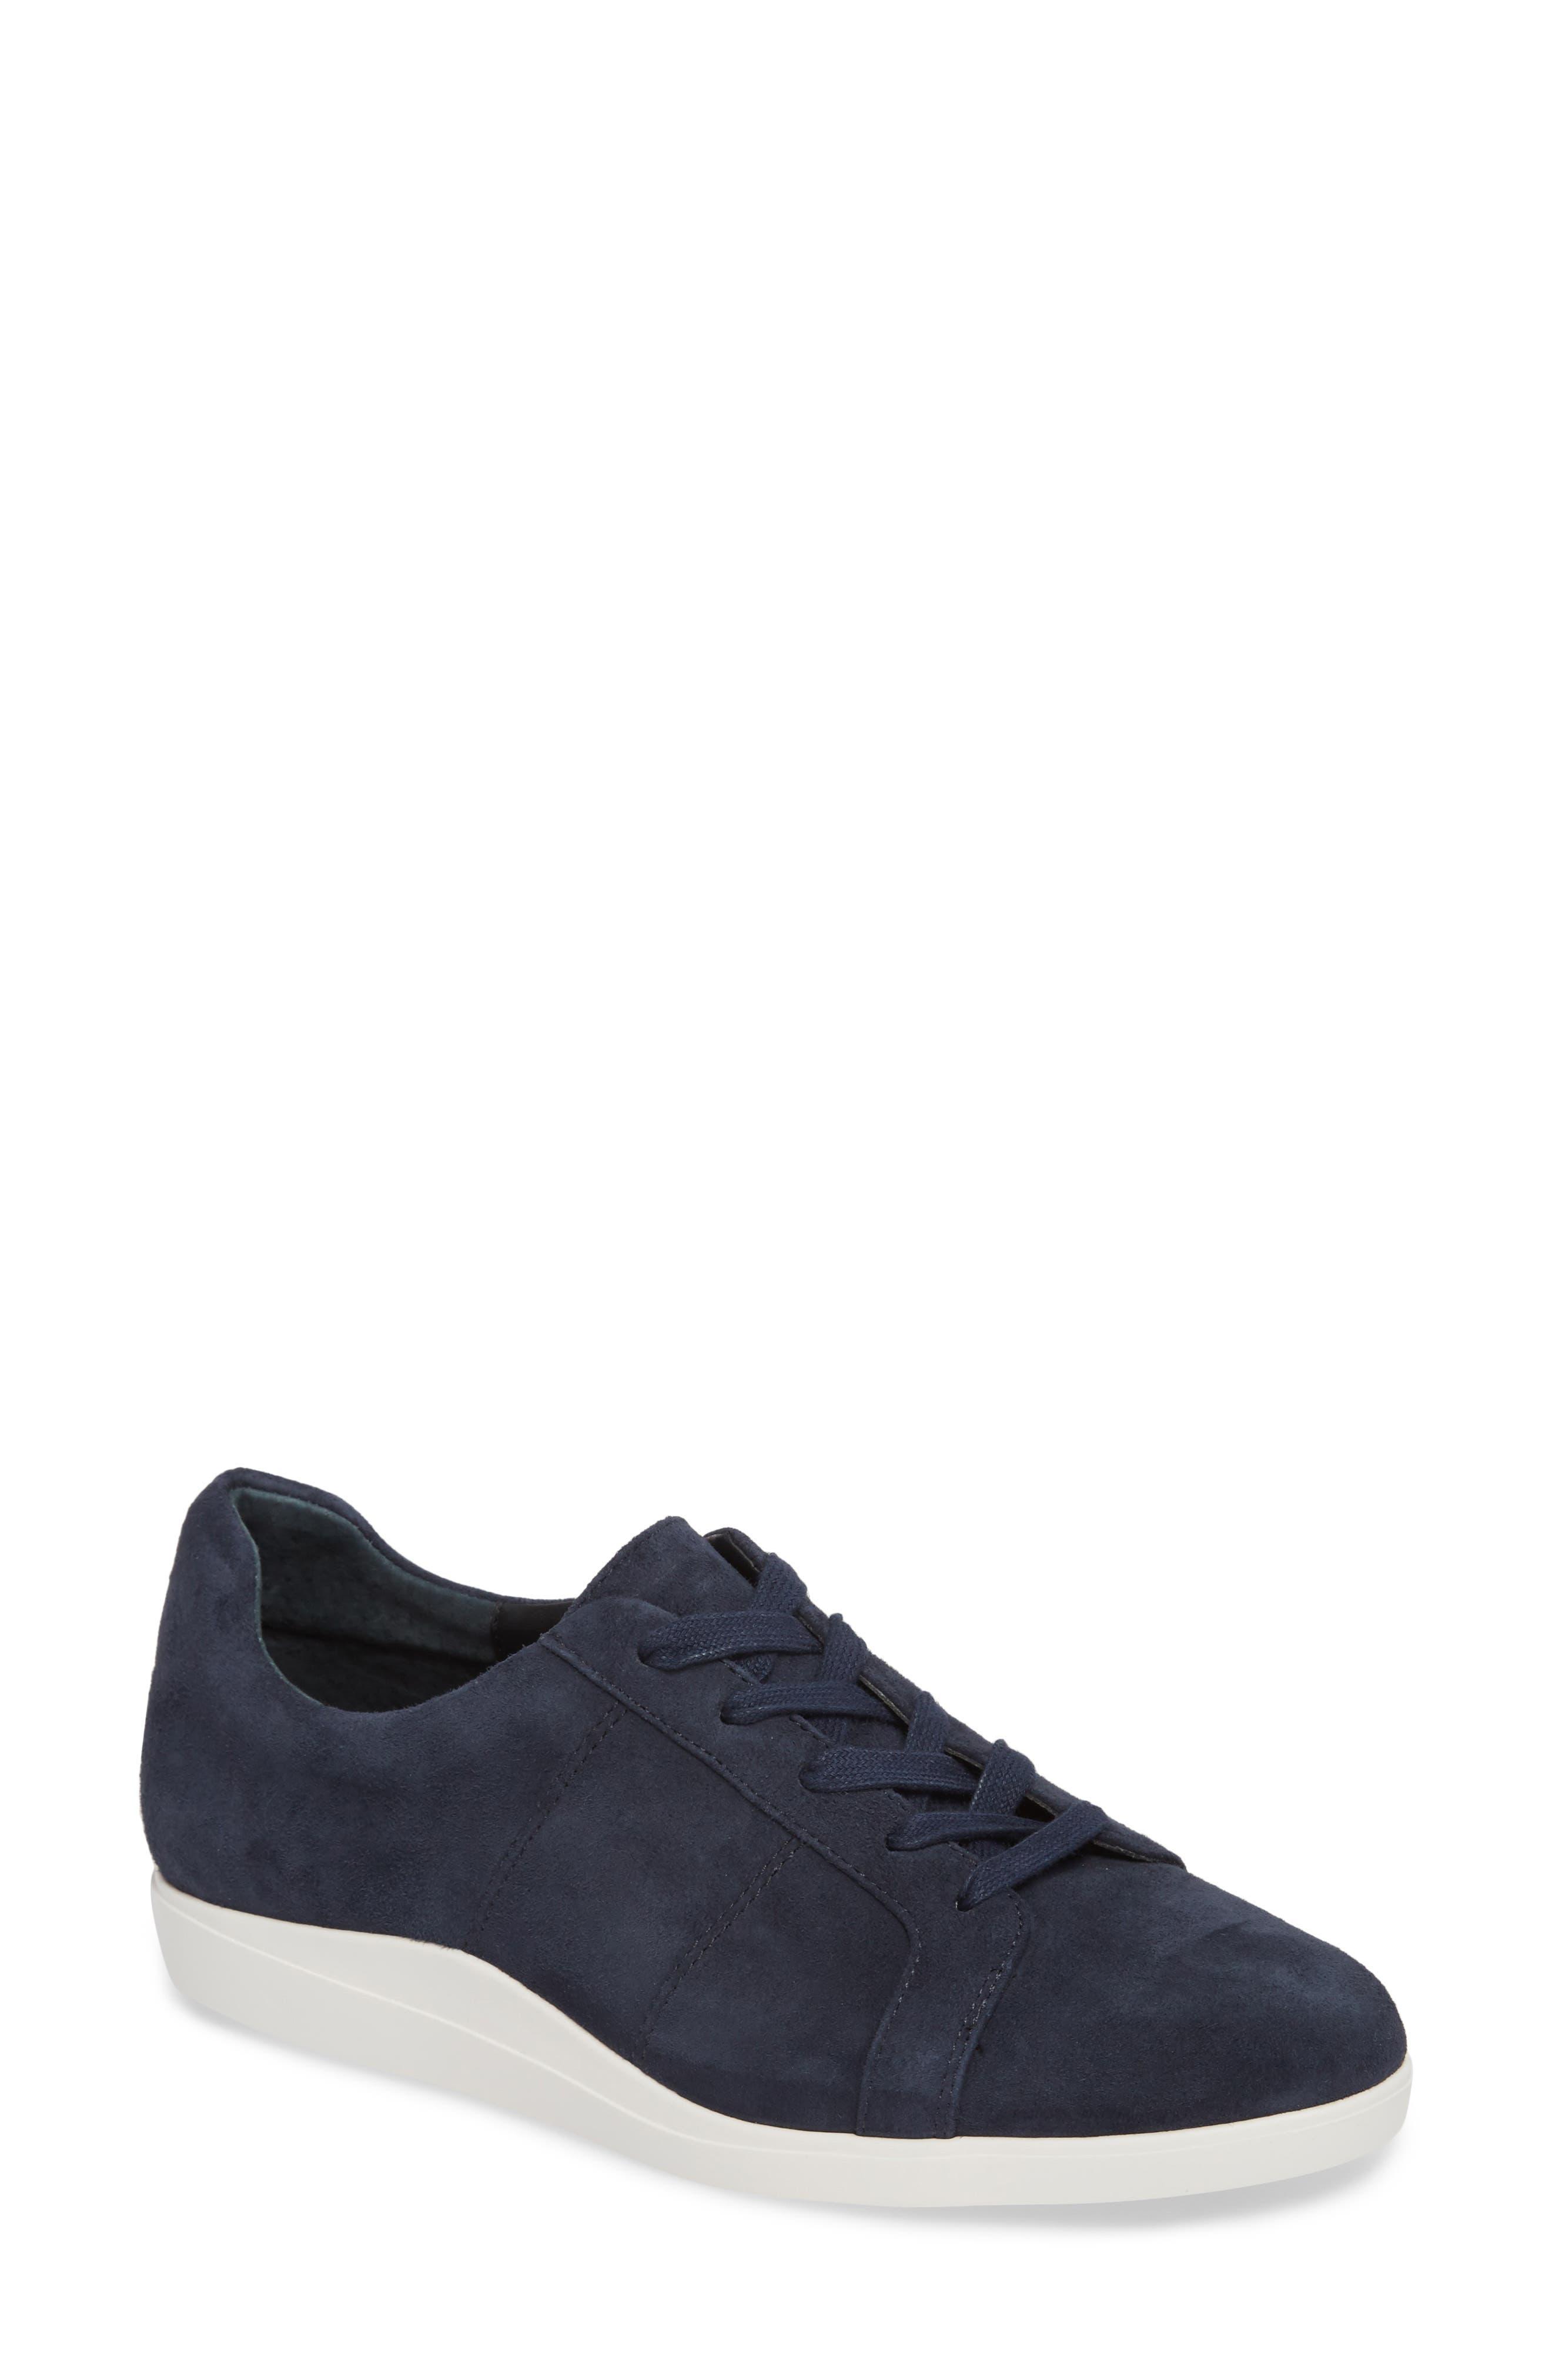 Sharleen Sneaker,                             Main thumbnail 4, color,